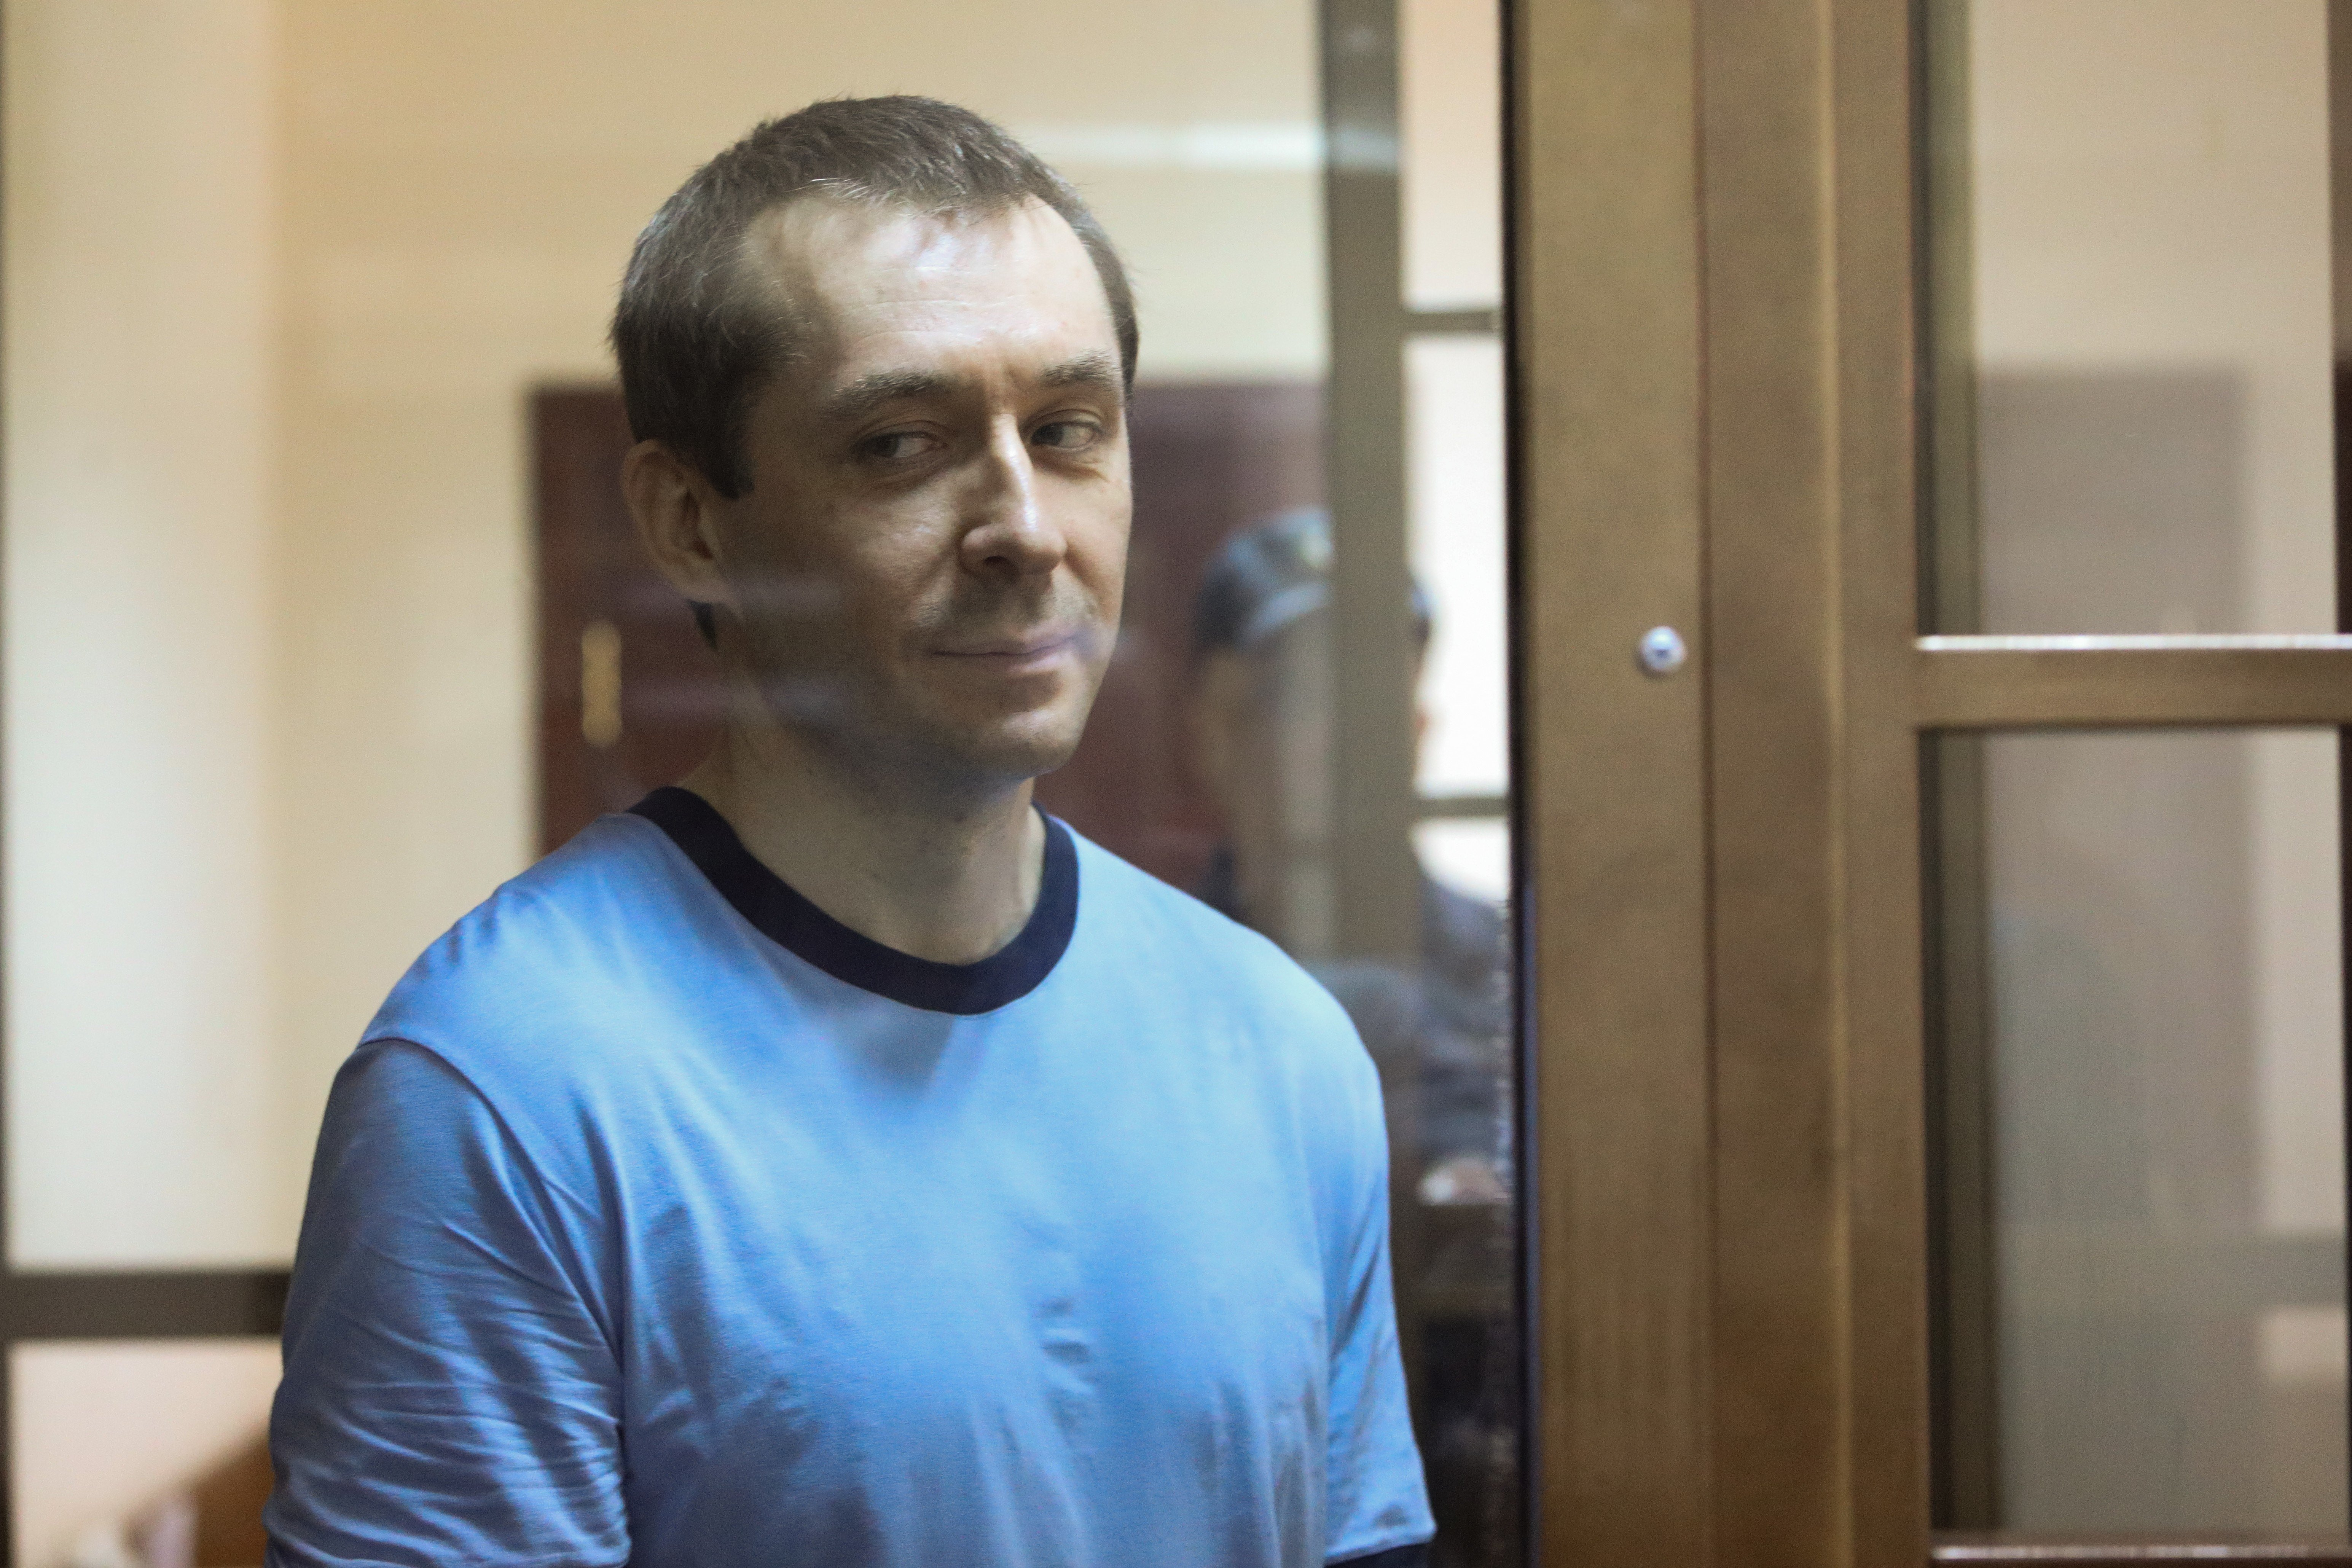 призналась, дмитрий захарченко последние новости фото солдату